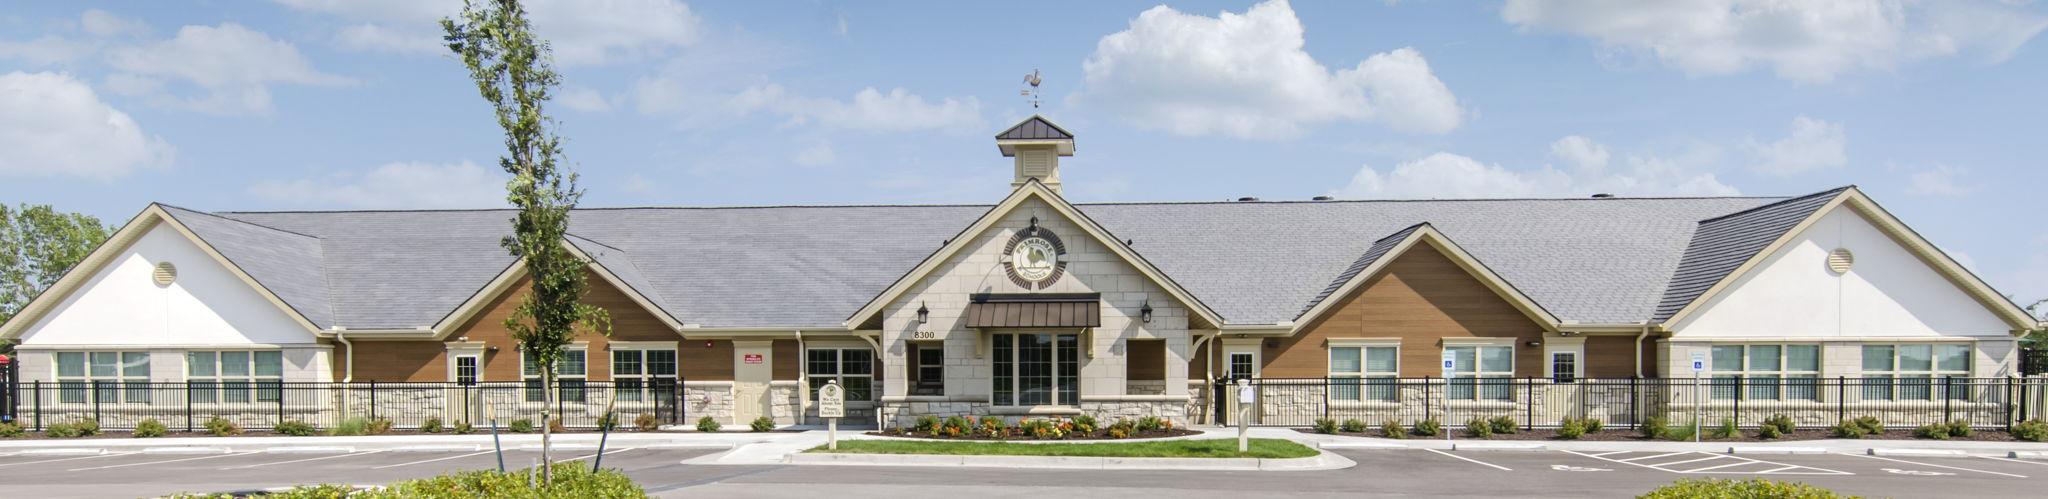 Exterior of Primrose School of Blue Valley